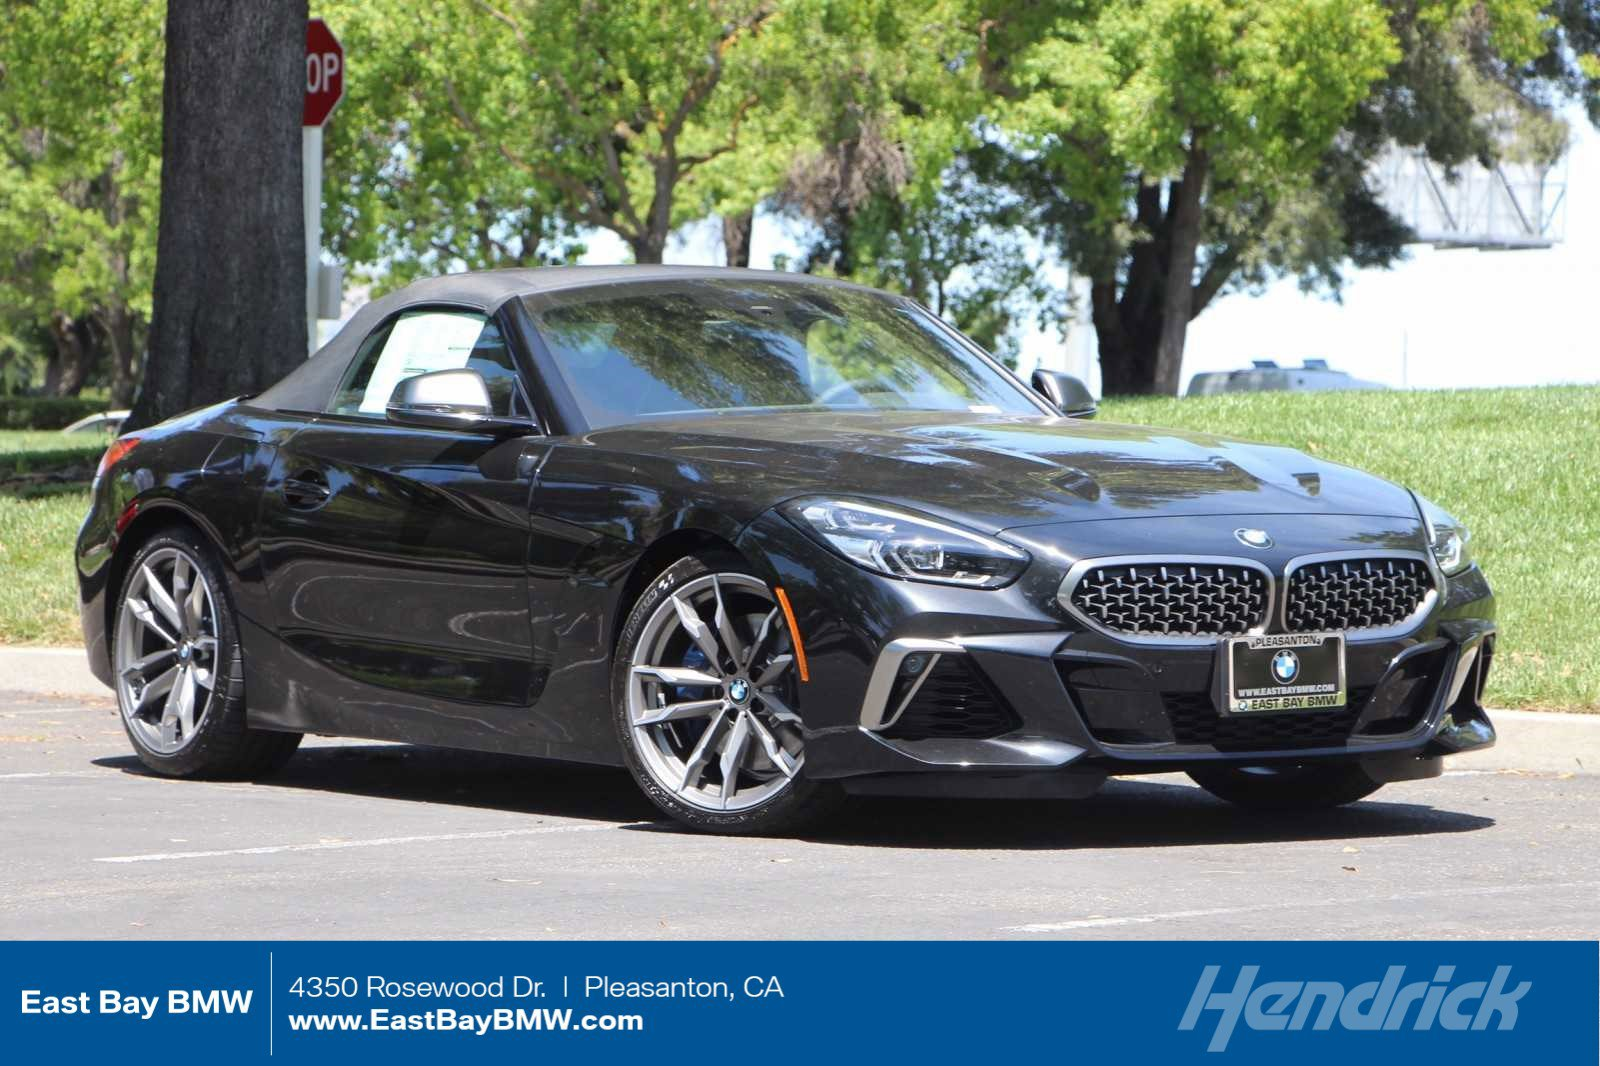 New 2020 BMW Z4 sDriveM40i